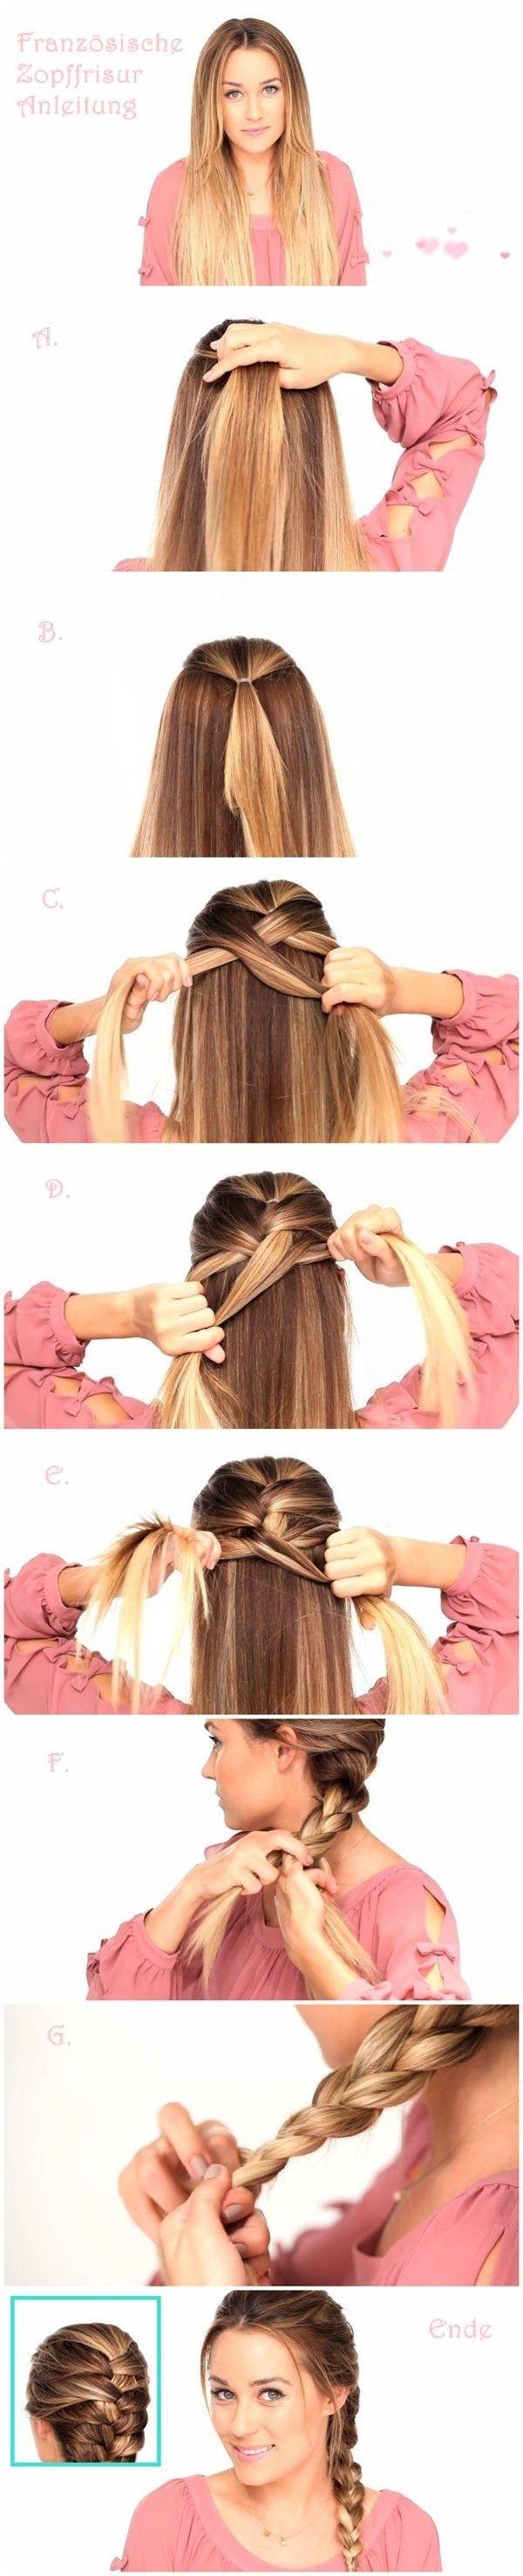 Surprising 20 Cute And Easy Braided Hairstyle Tutorials Latest Styles Short Hairstyles Gunalazisus